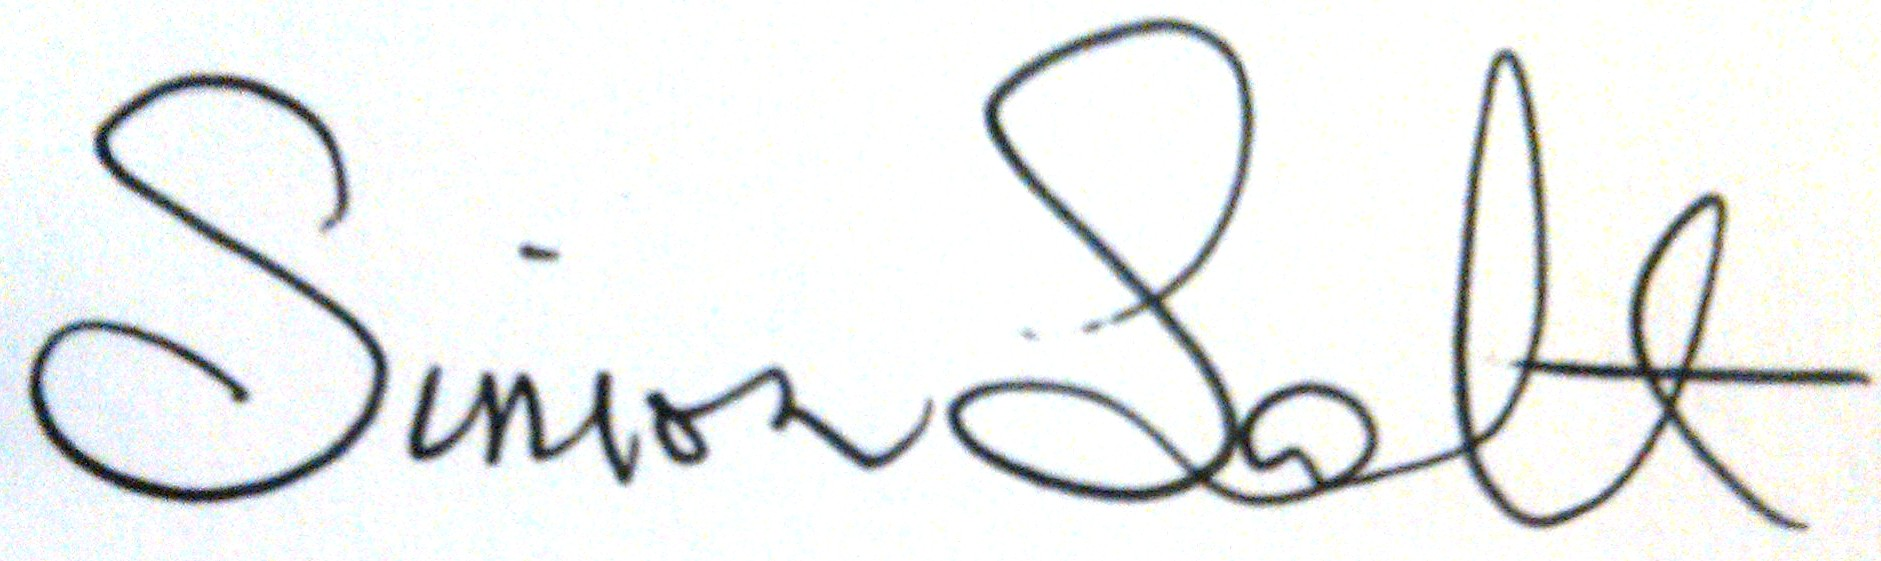 Simon Salt's Signature